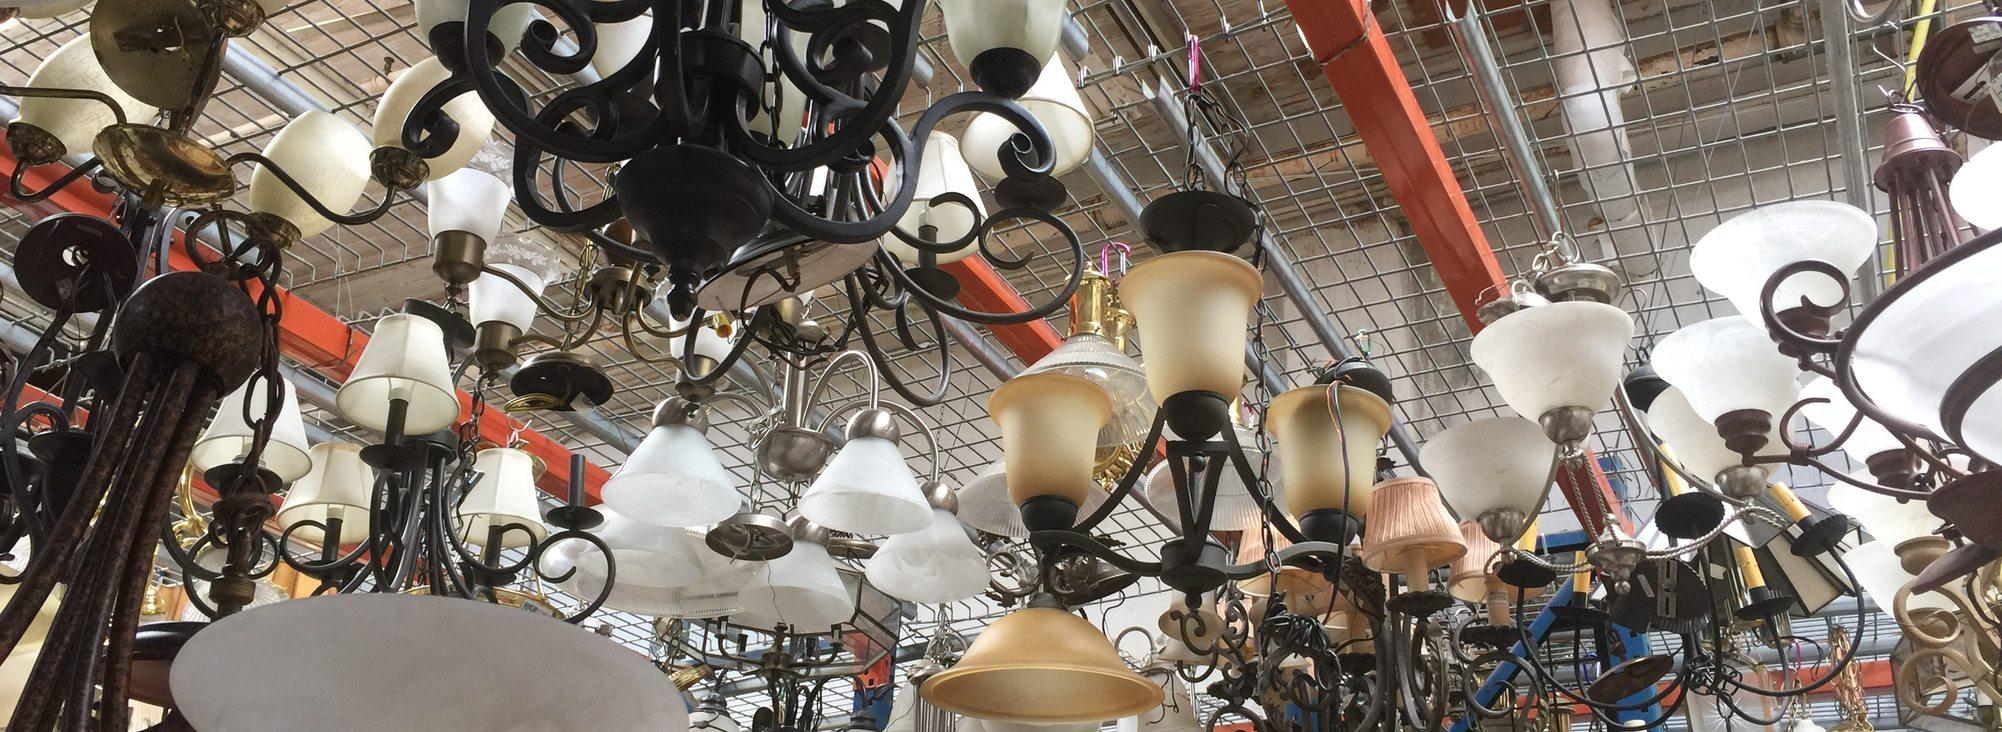 Image of lighting store